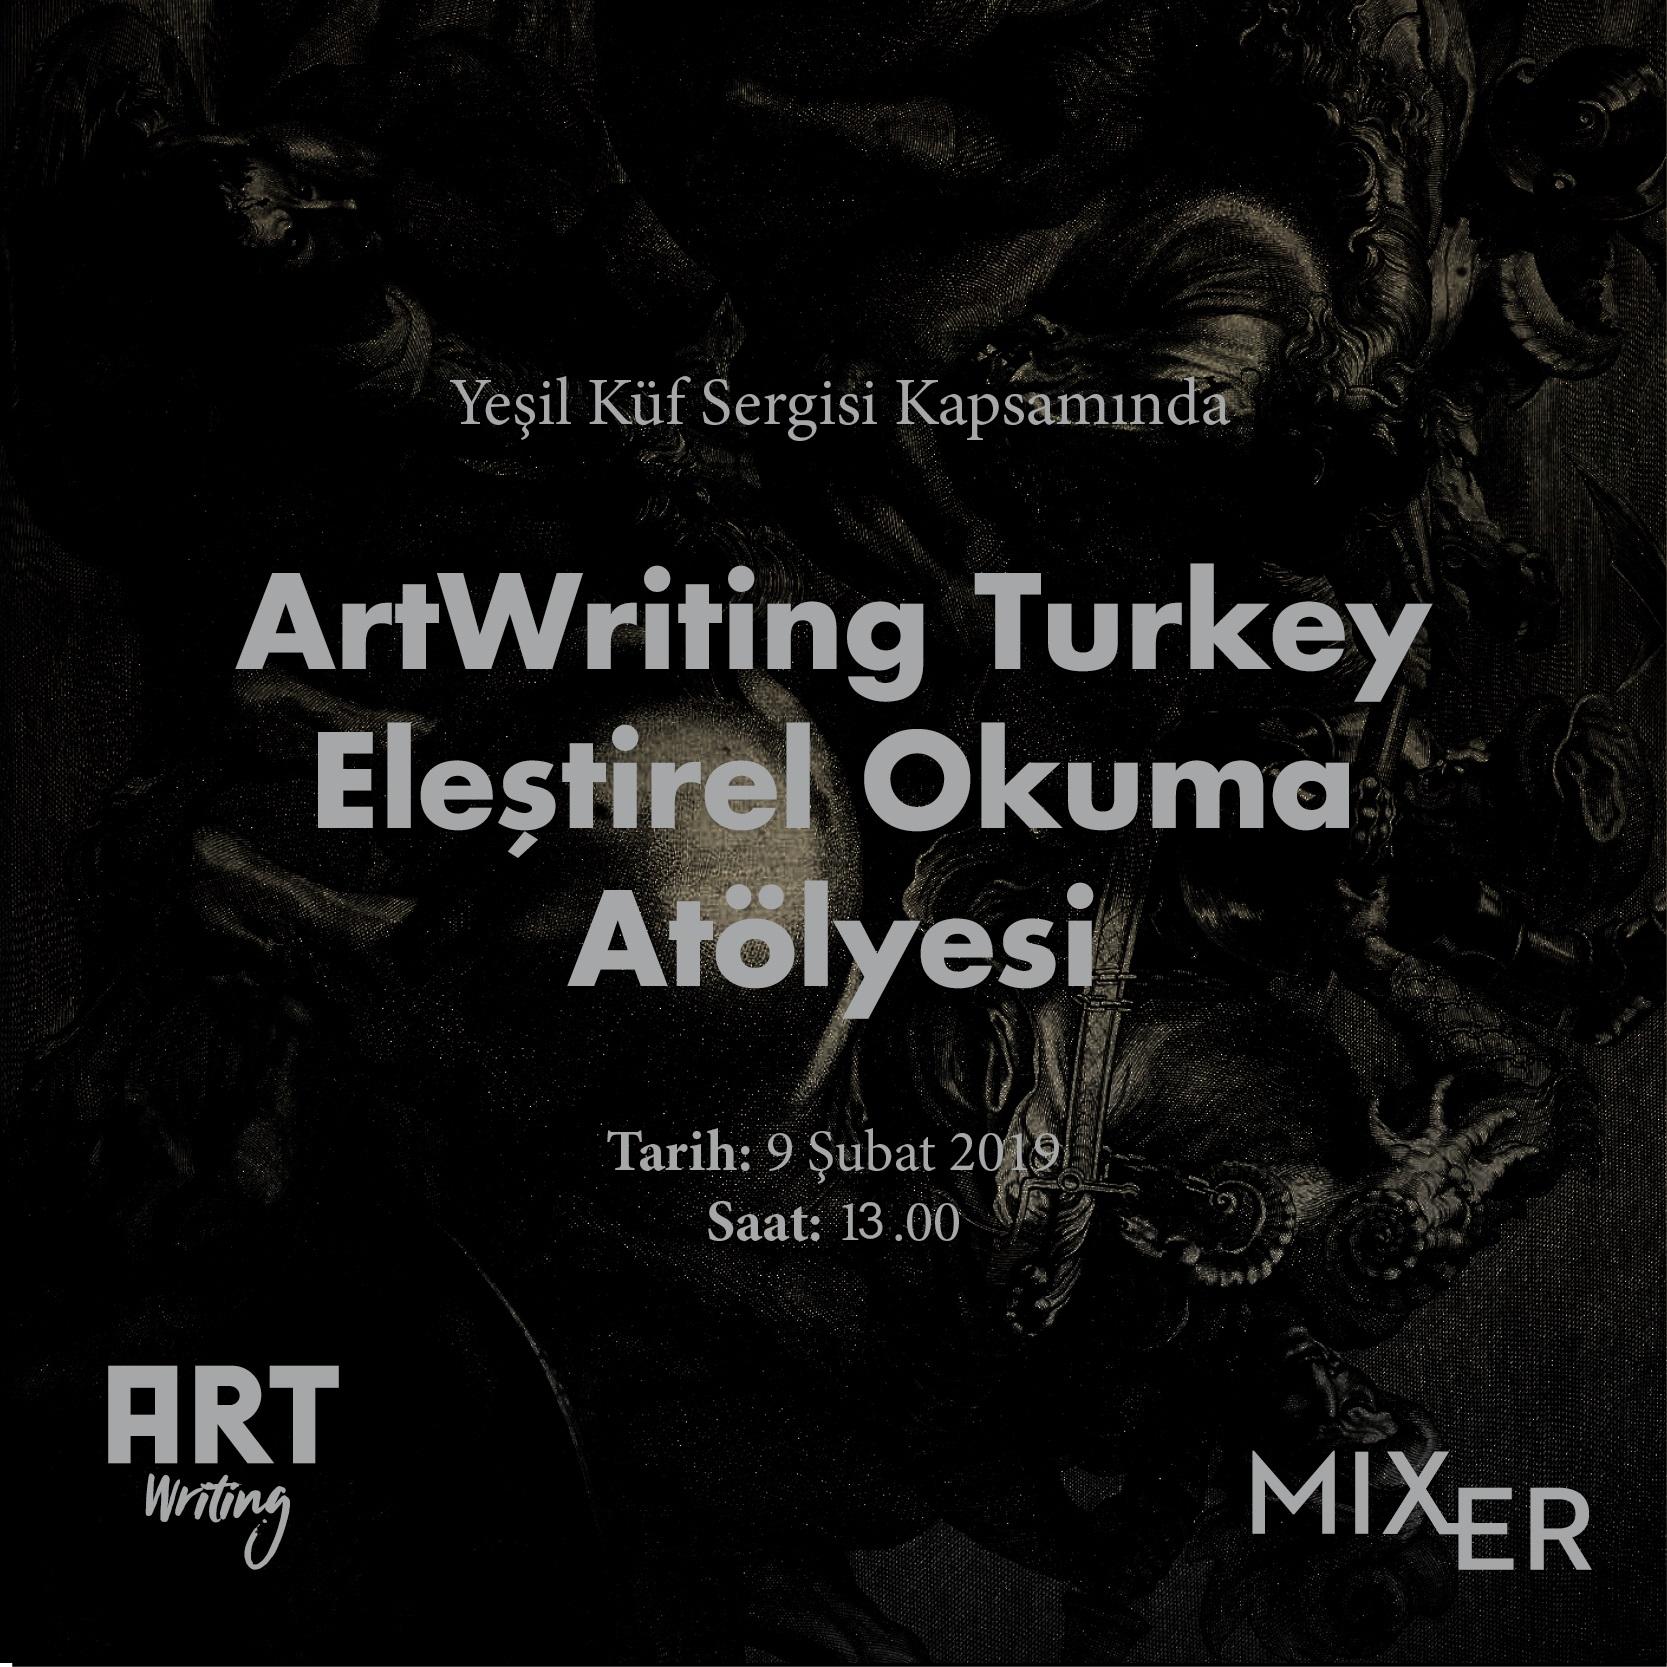 ArtWriting Turkey: Eleştirel Okuma Atölyesi